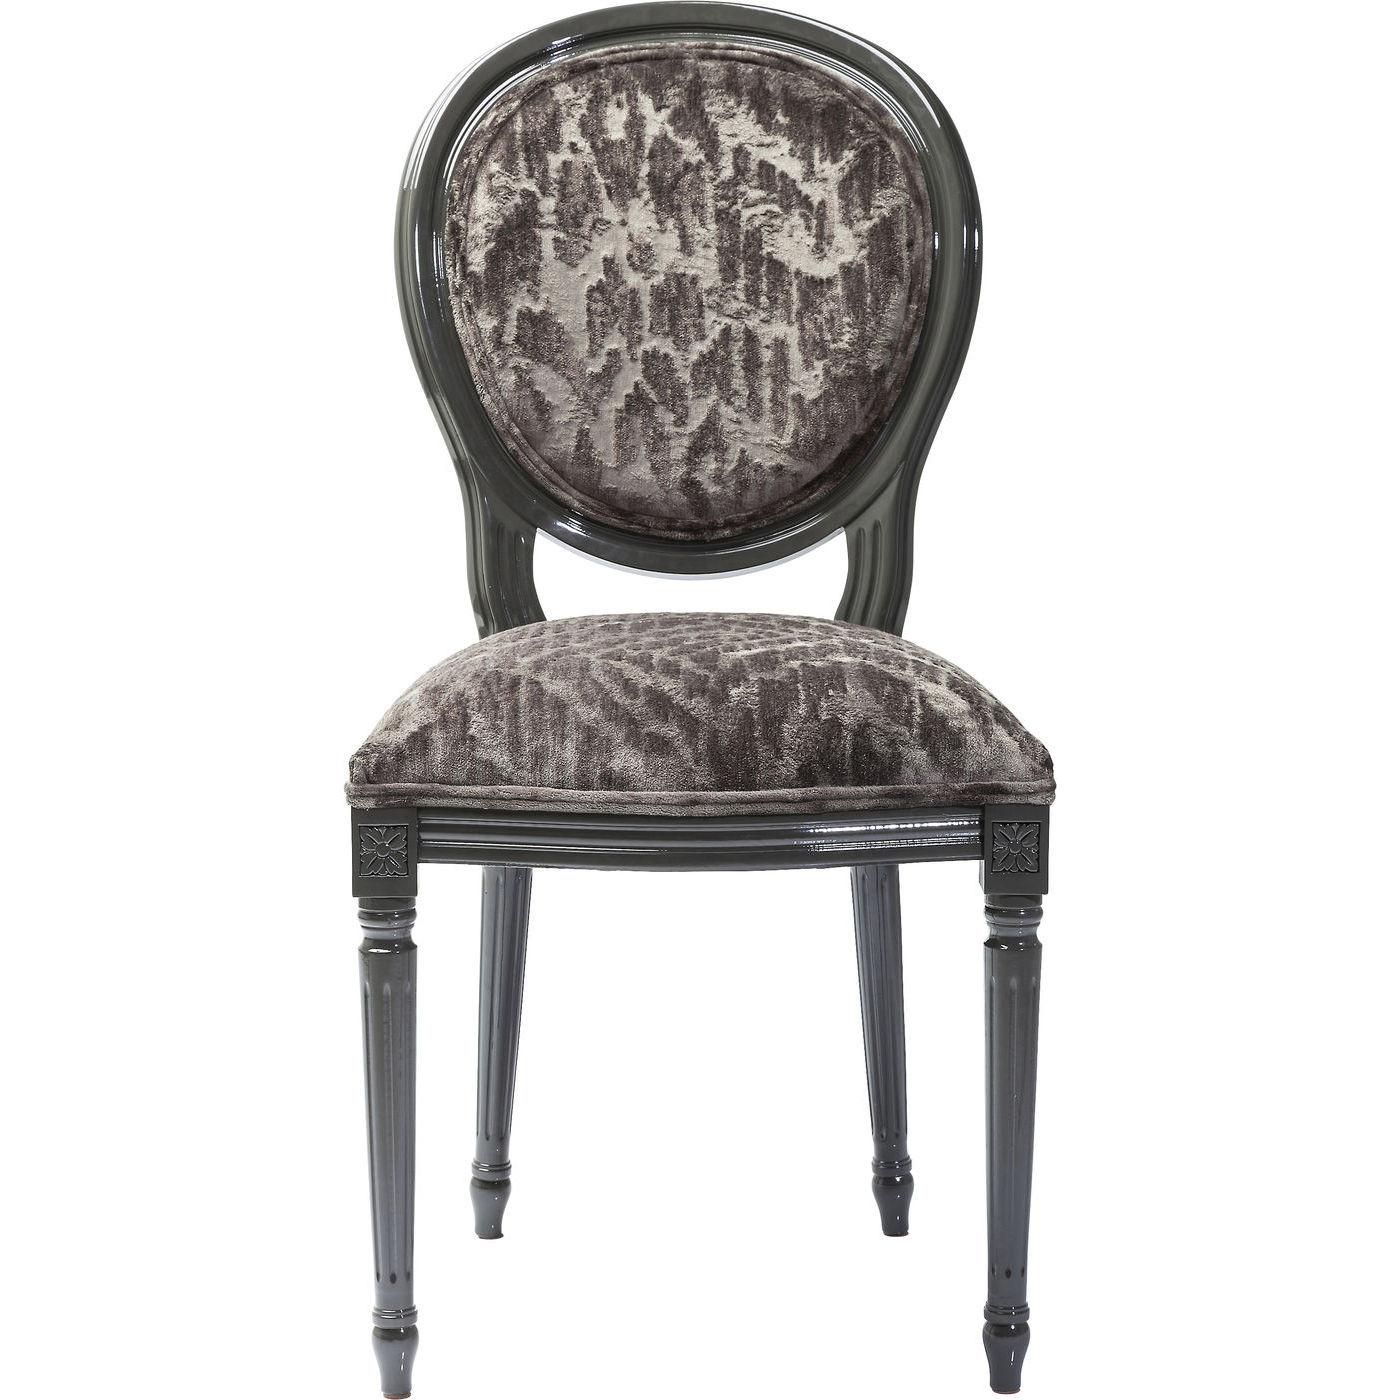 stuhl posh muddy cocoa kare design mutoni m bel. Black Bedroom Furniture Sets. Home Design Ideas